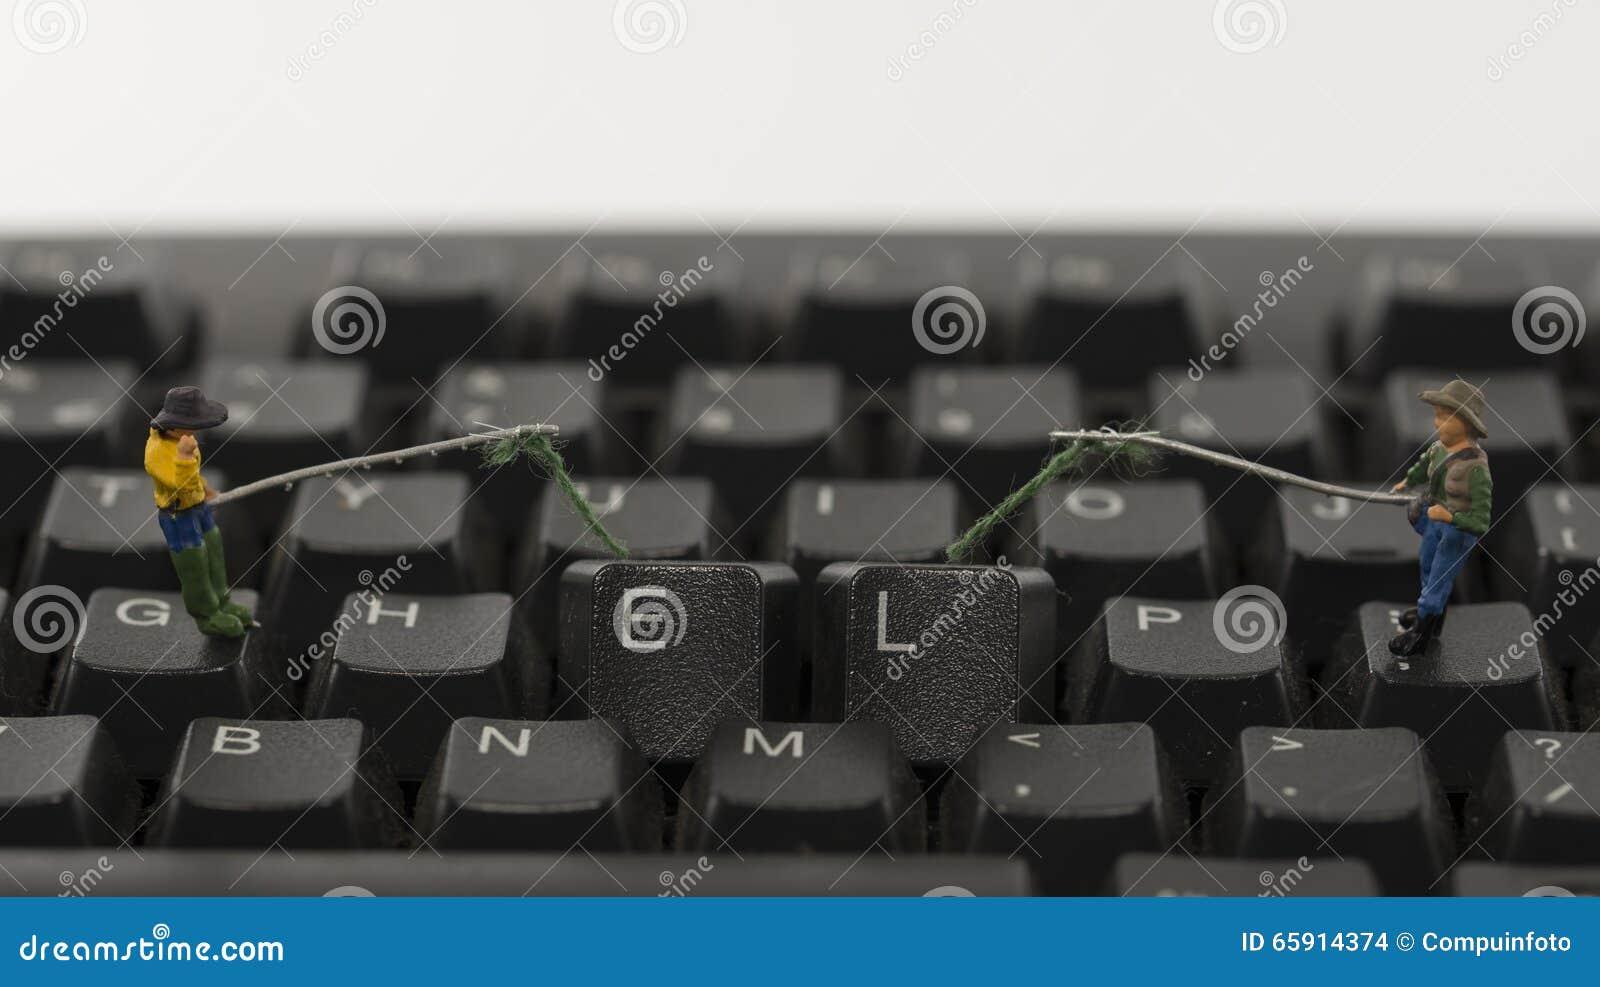 Help Computer Hacking Stock Photo - Image: 65914374